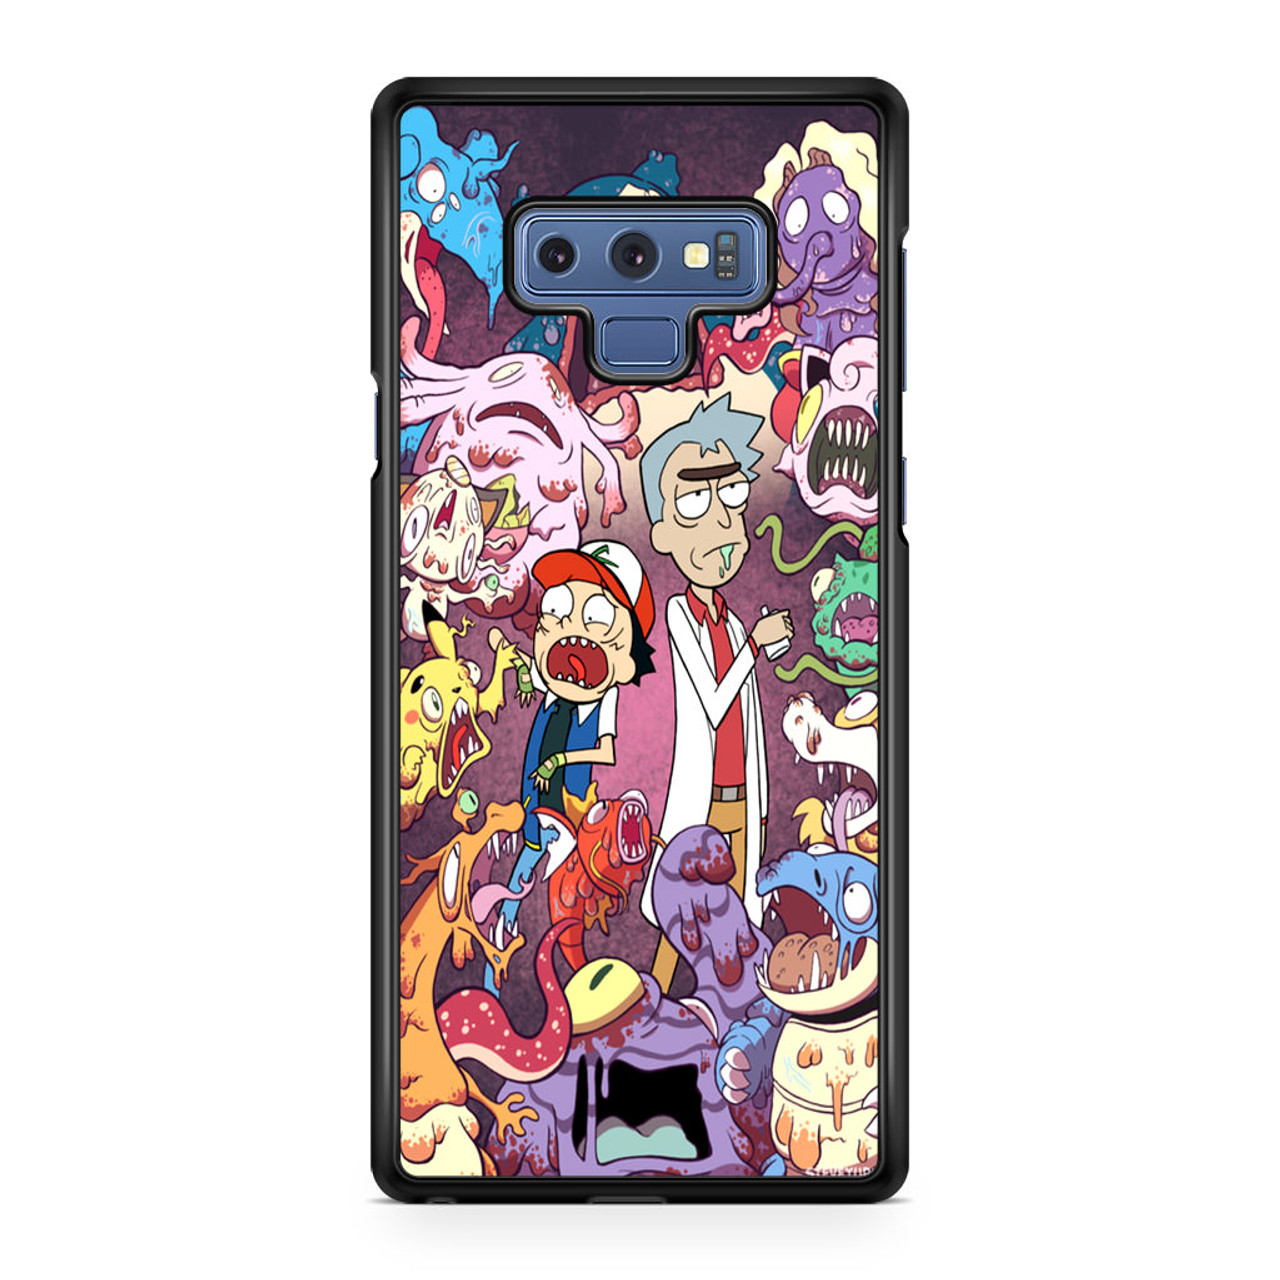 sale retailer 179e6 a552a Rick And Morty Pokemon1 Samsung Galaxy Note 9 Case